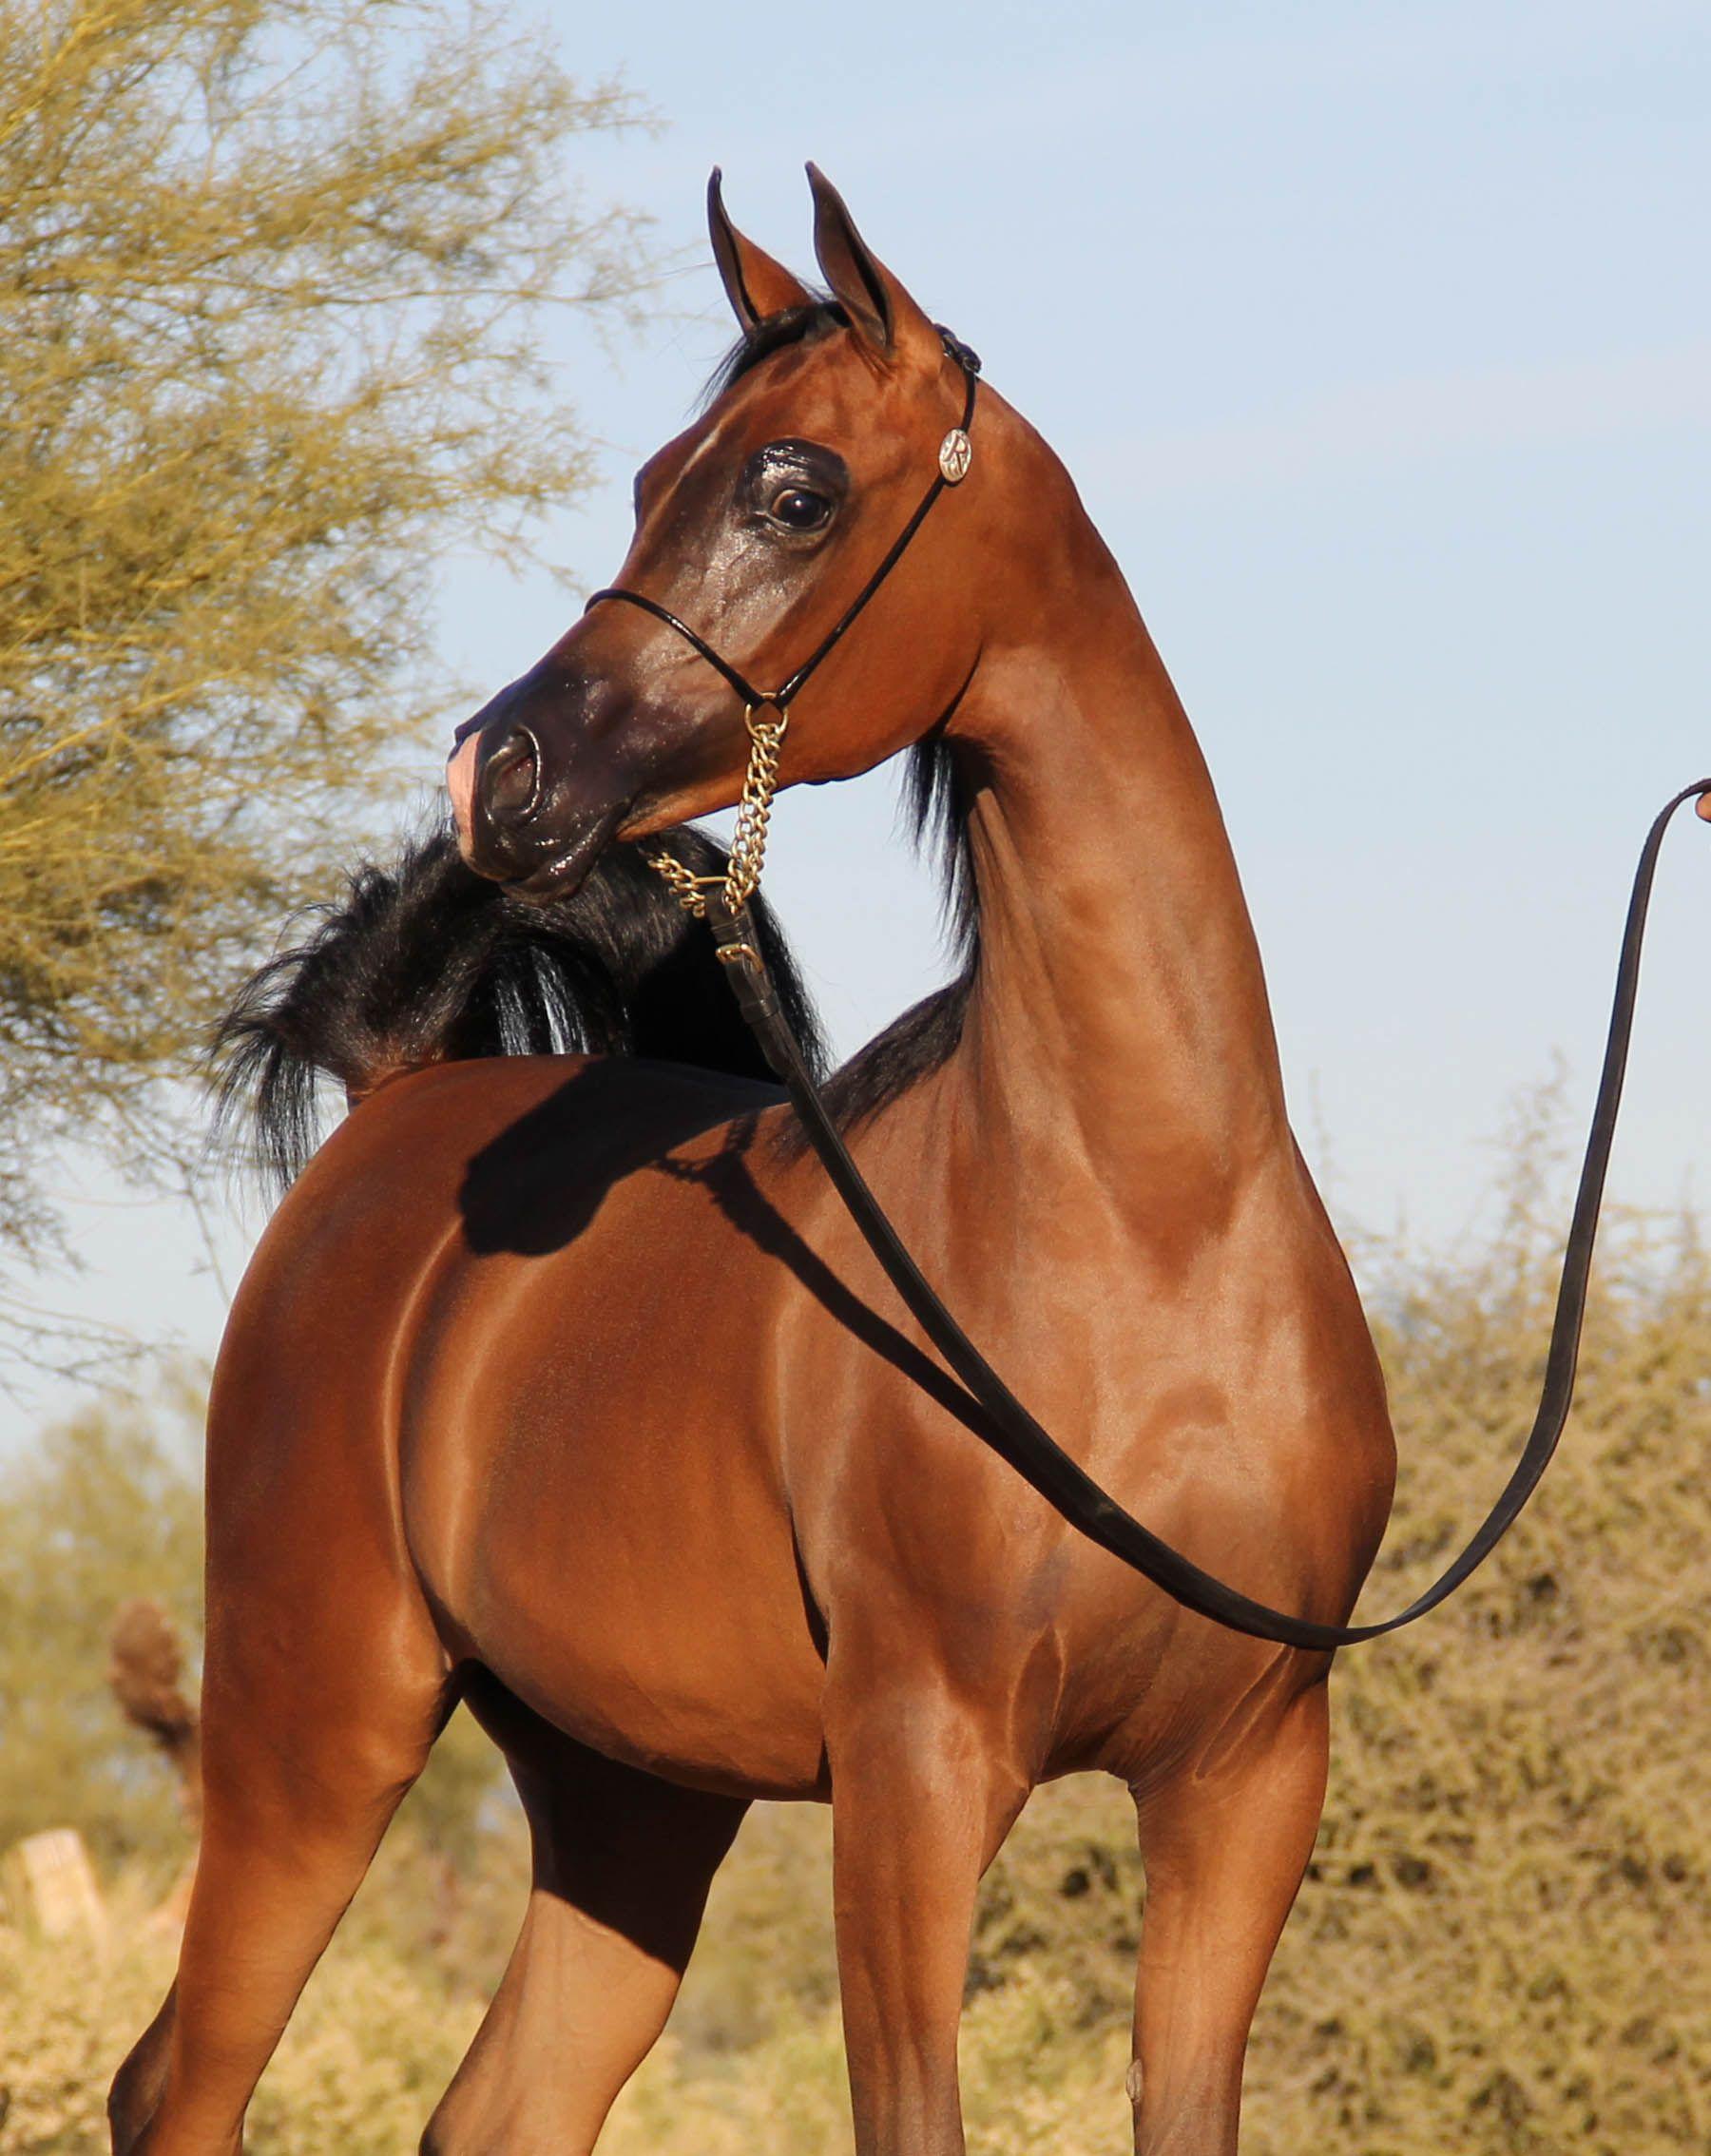 Rejoice Dsw Pcf Vision X April In Parys Arabian Horse Arabian